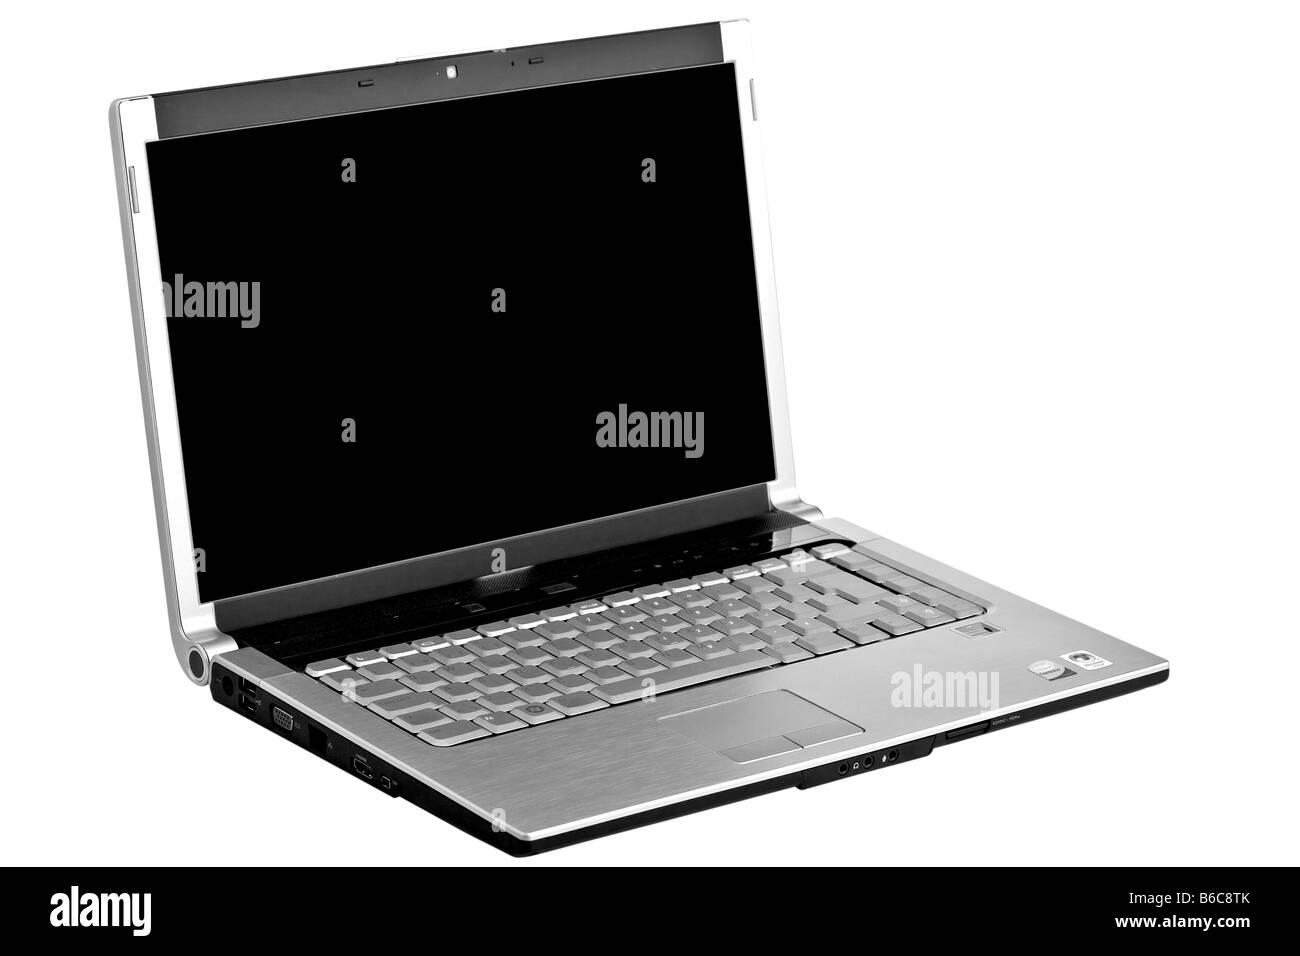 Computadora labtop Imagen De Stock